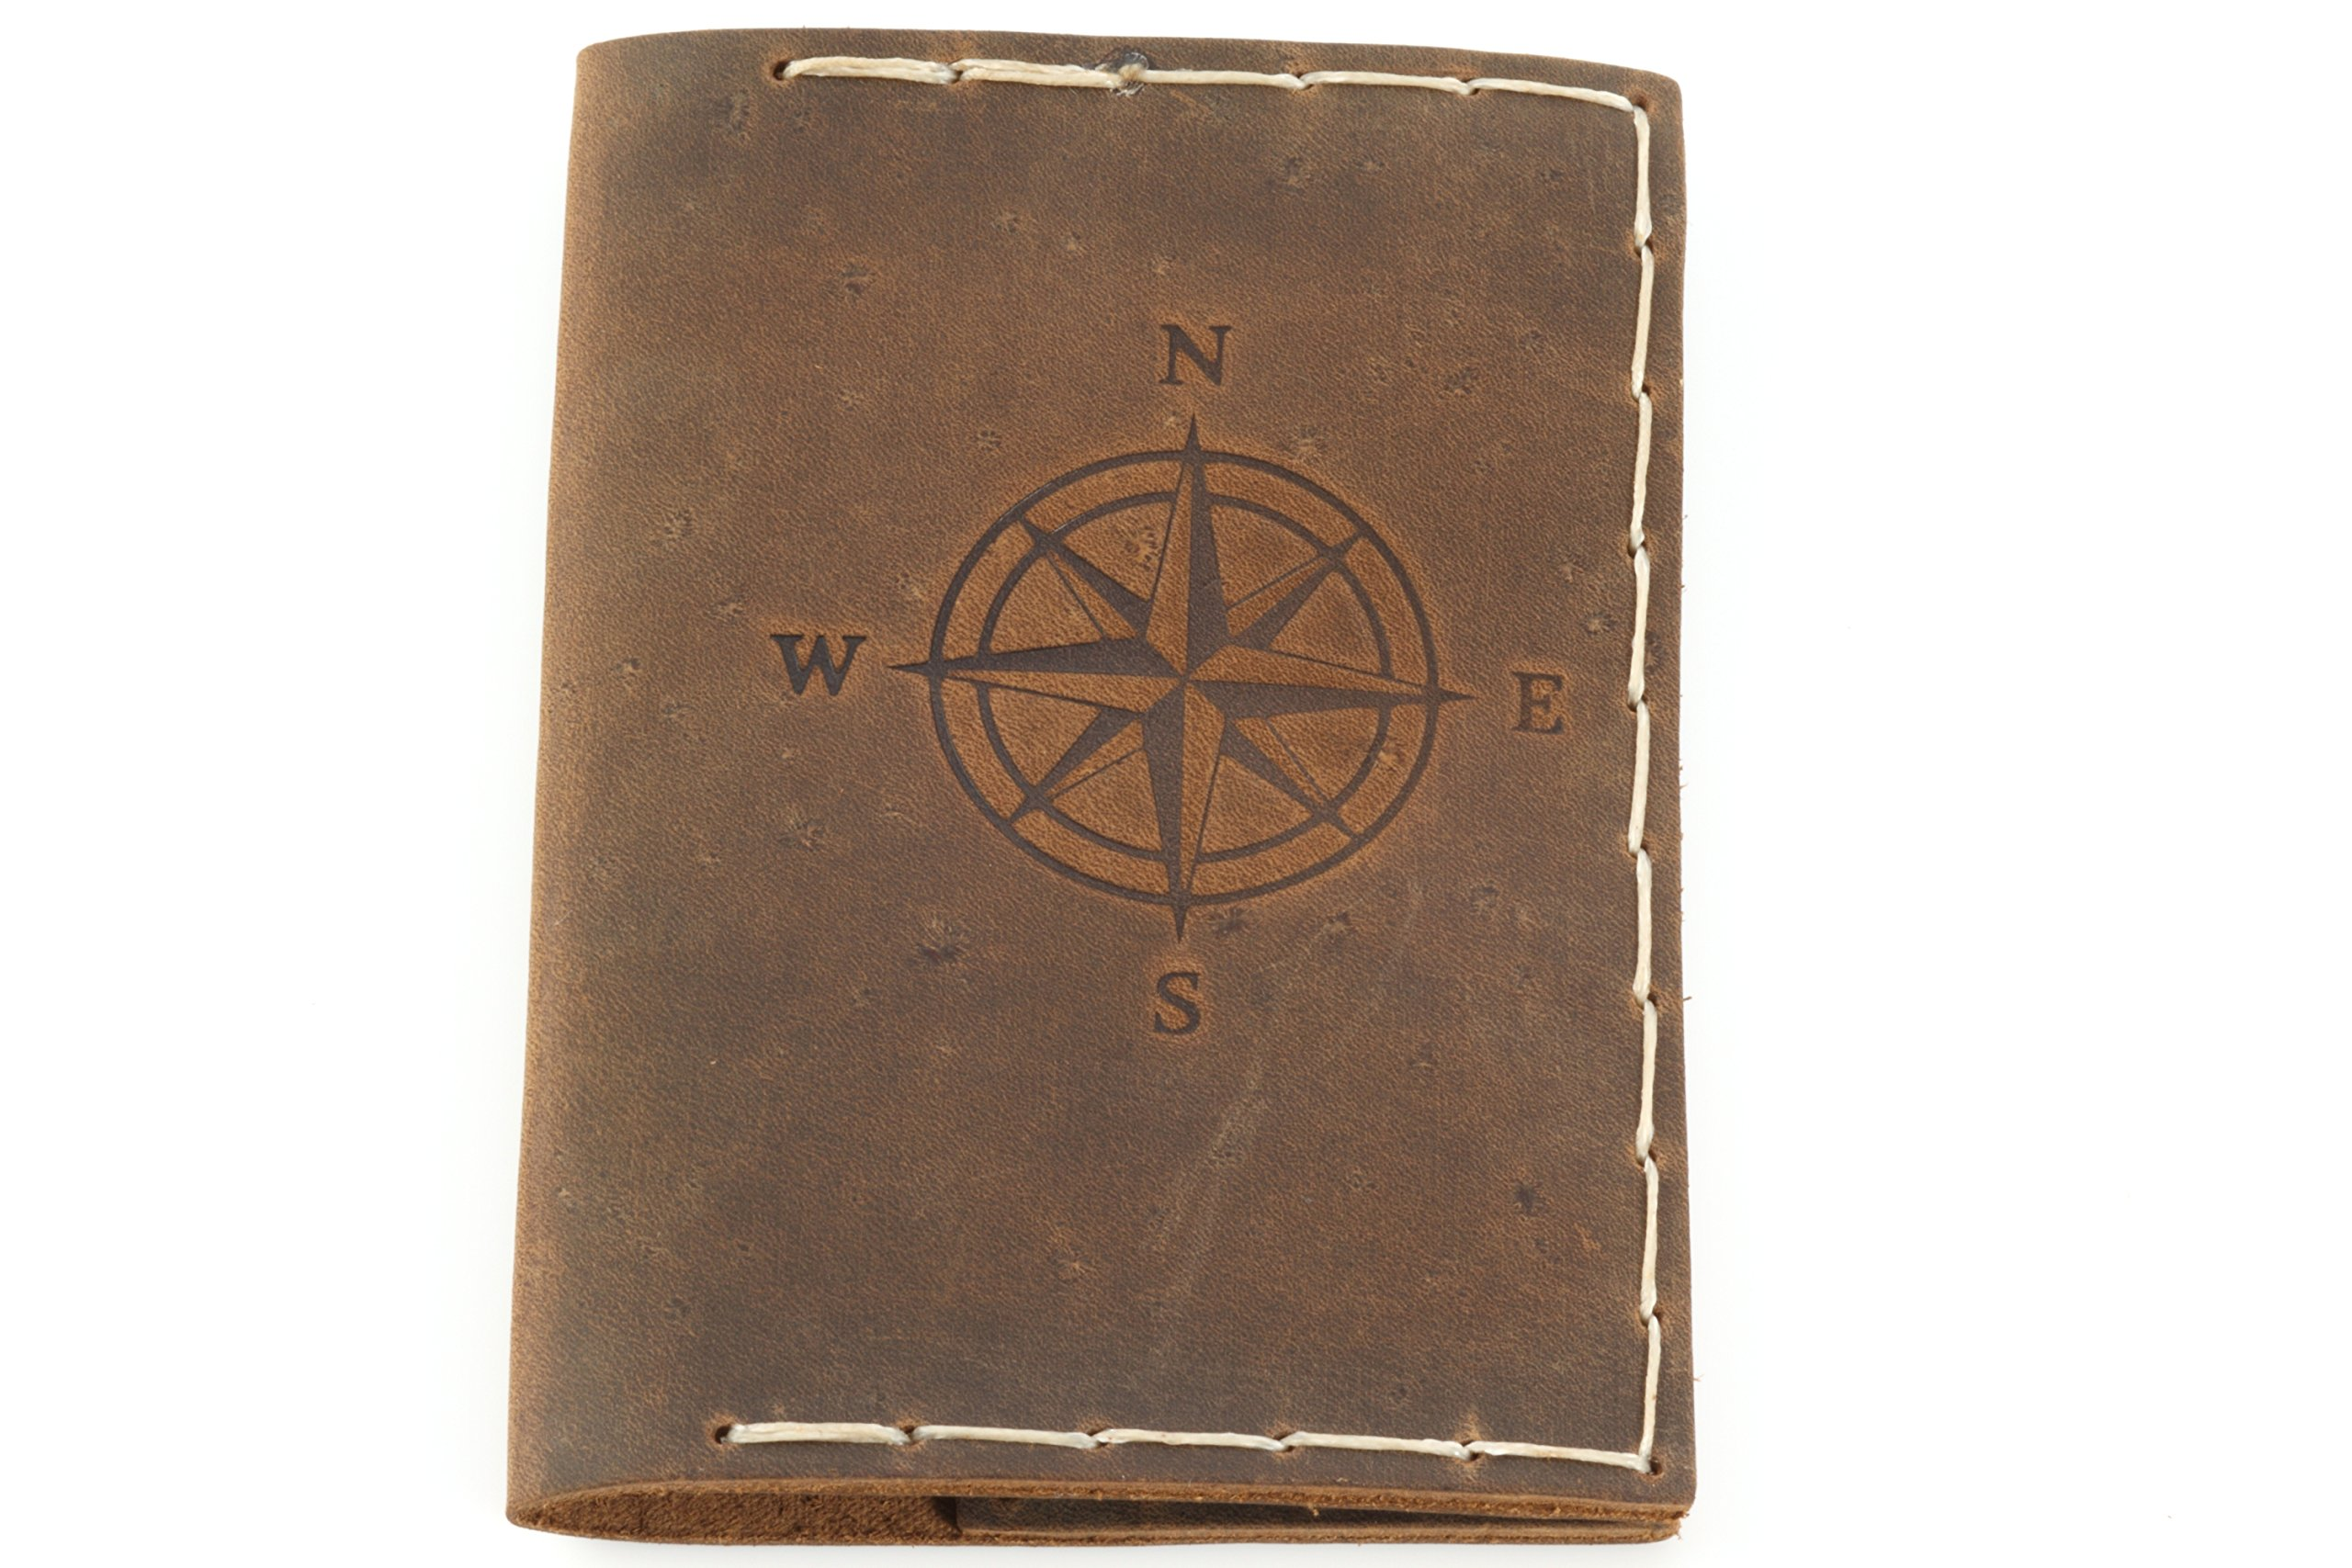 Passport Wallet,Passport Cover,Passport Holder,Leather passport wallet